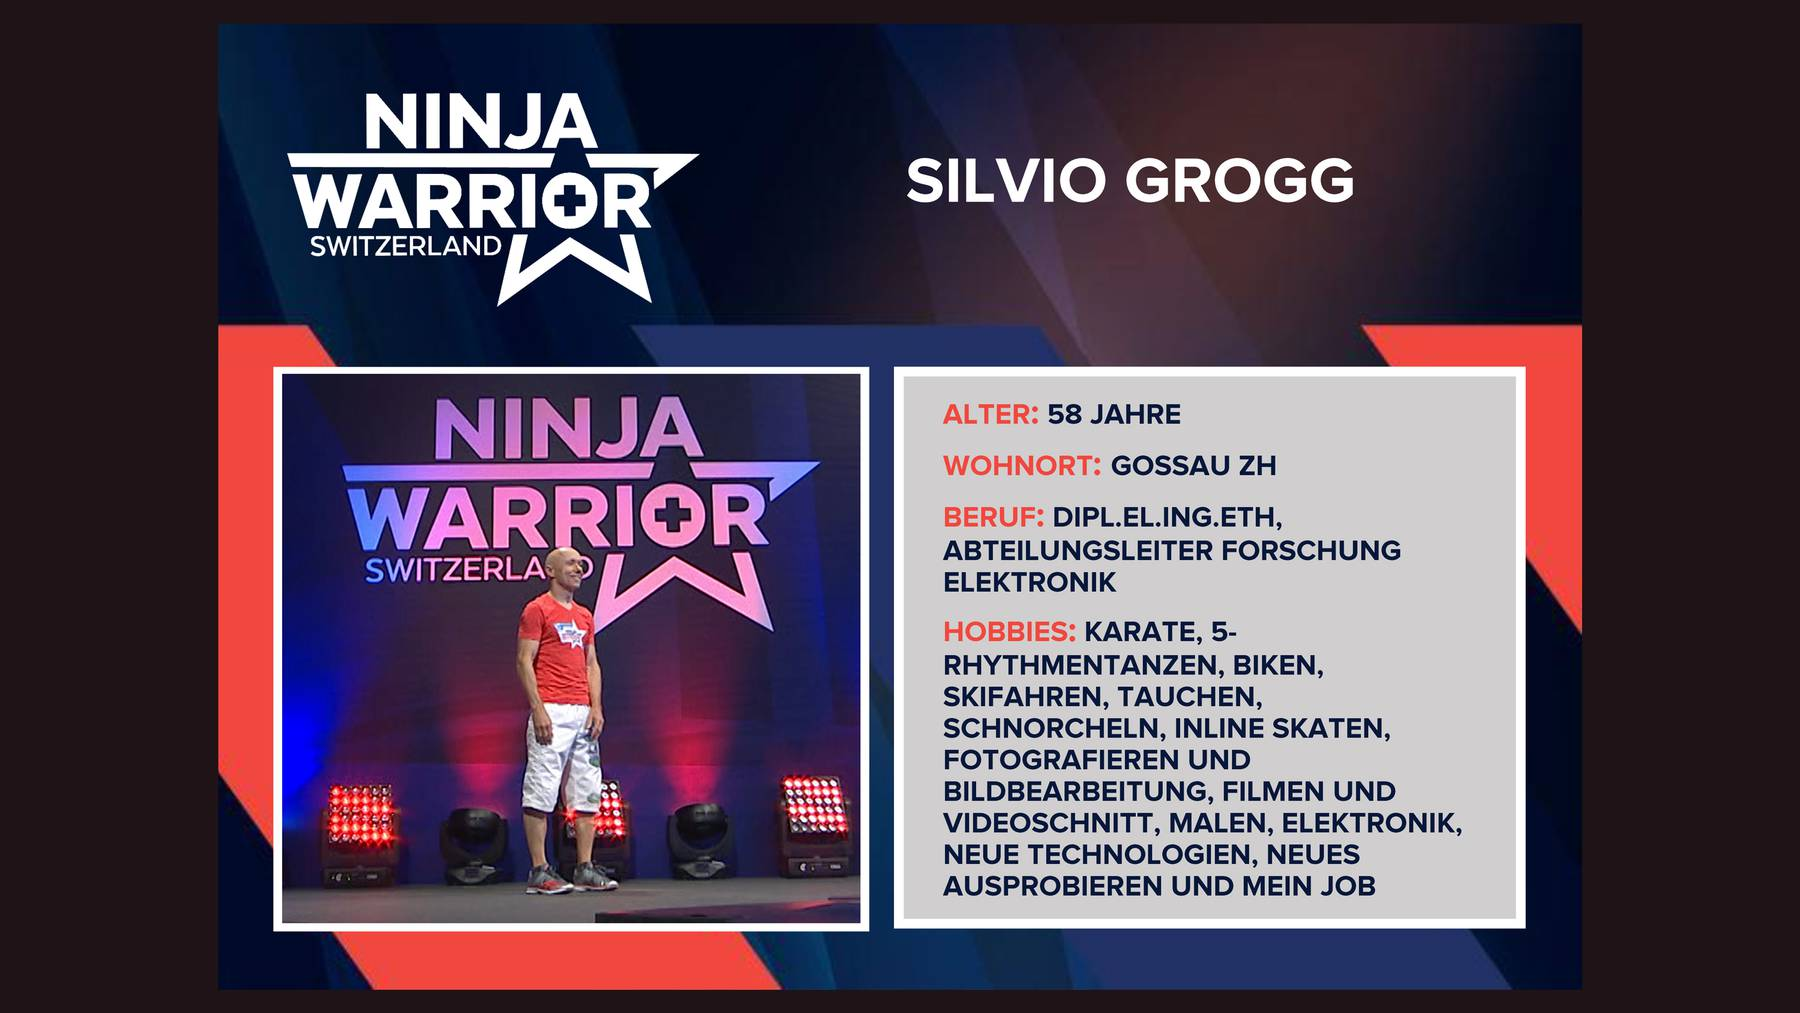 Silvio Grogg